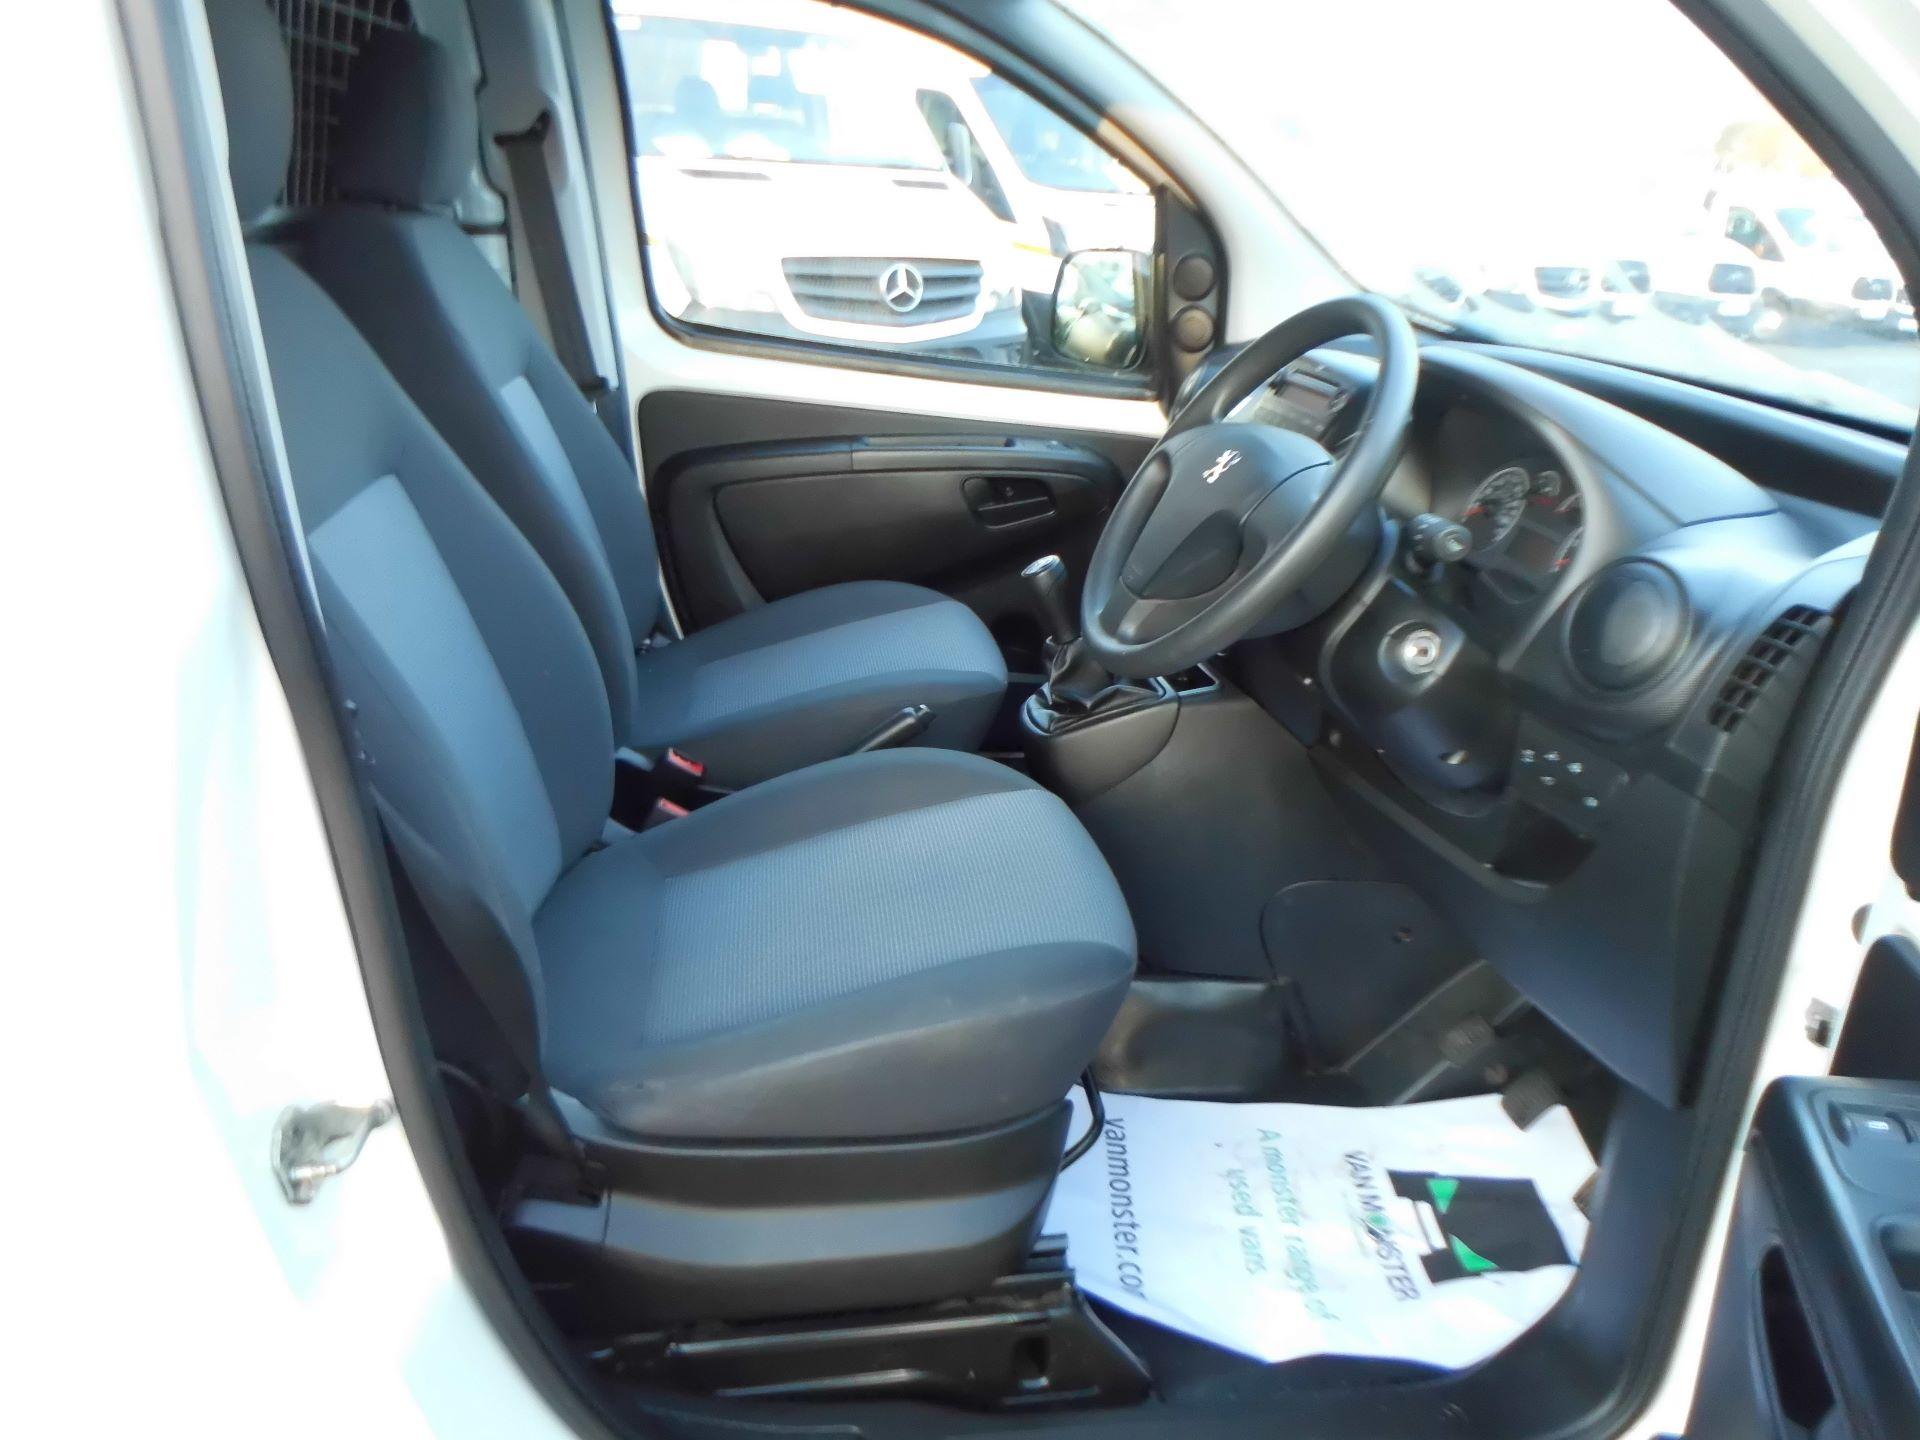 2016 Peugeot Bipper  1.3 HDI 75 S NON S/S  EURO 5 (NV16XHB) Image 5